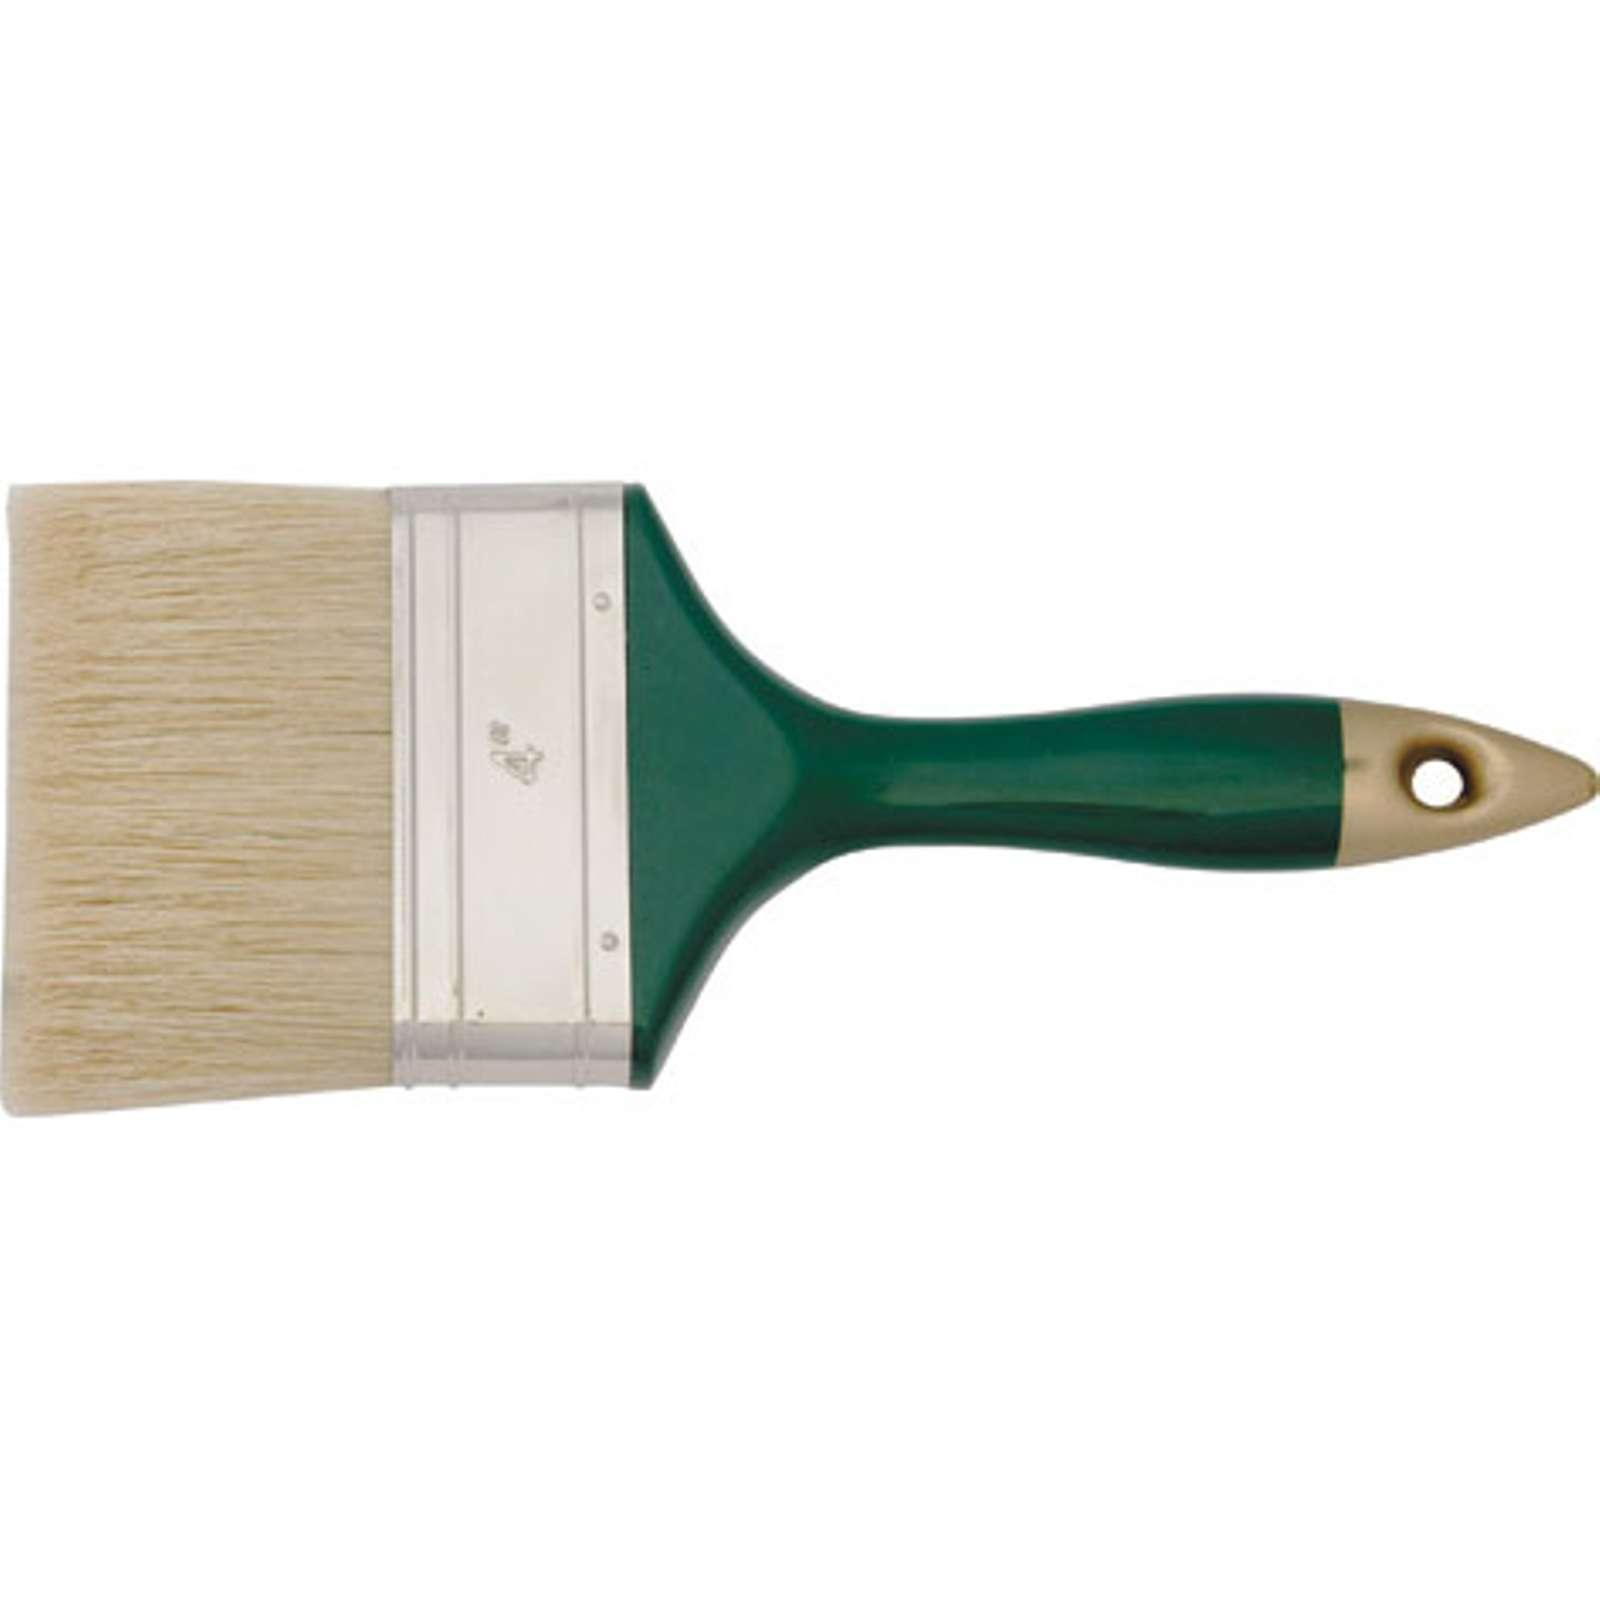 "Кисть флейцевая ""Гранд"", натуральная светлая щетина, пластиковая ручка,art.F441P 1"" (25 мм), FIT HQ"